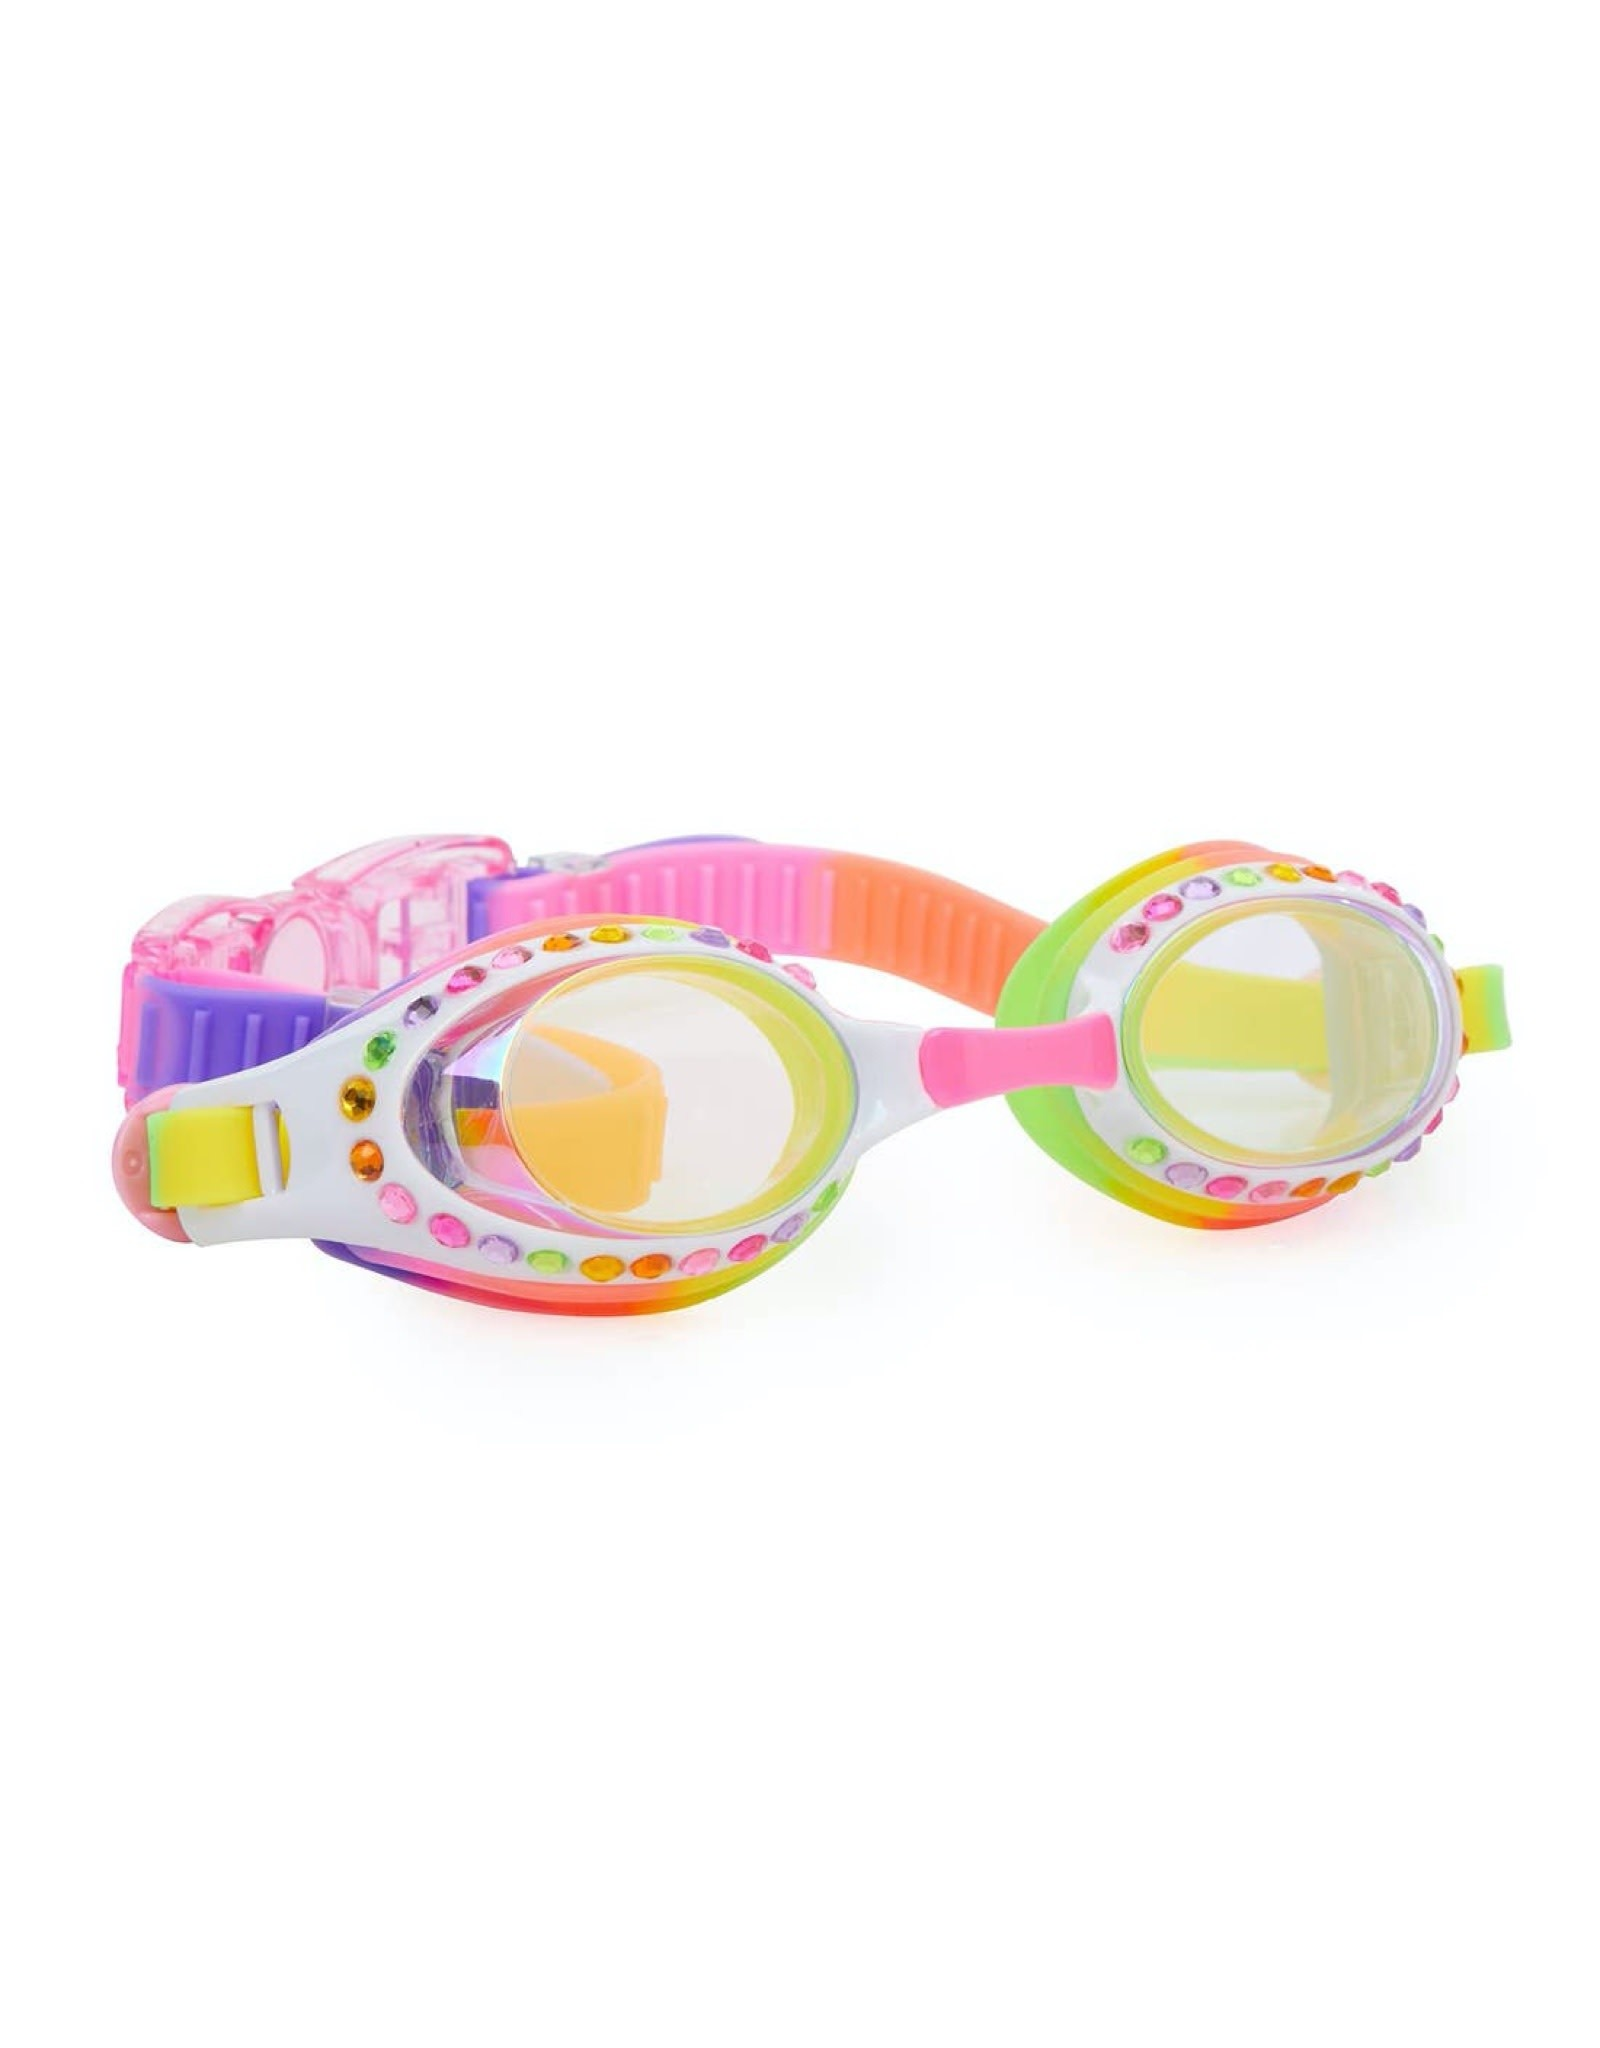 Bling2O Confetti Goggles (Assorted)